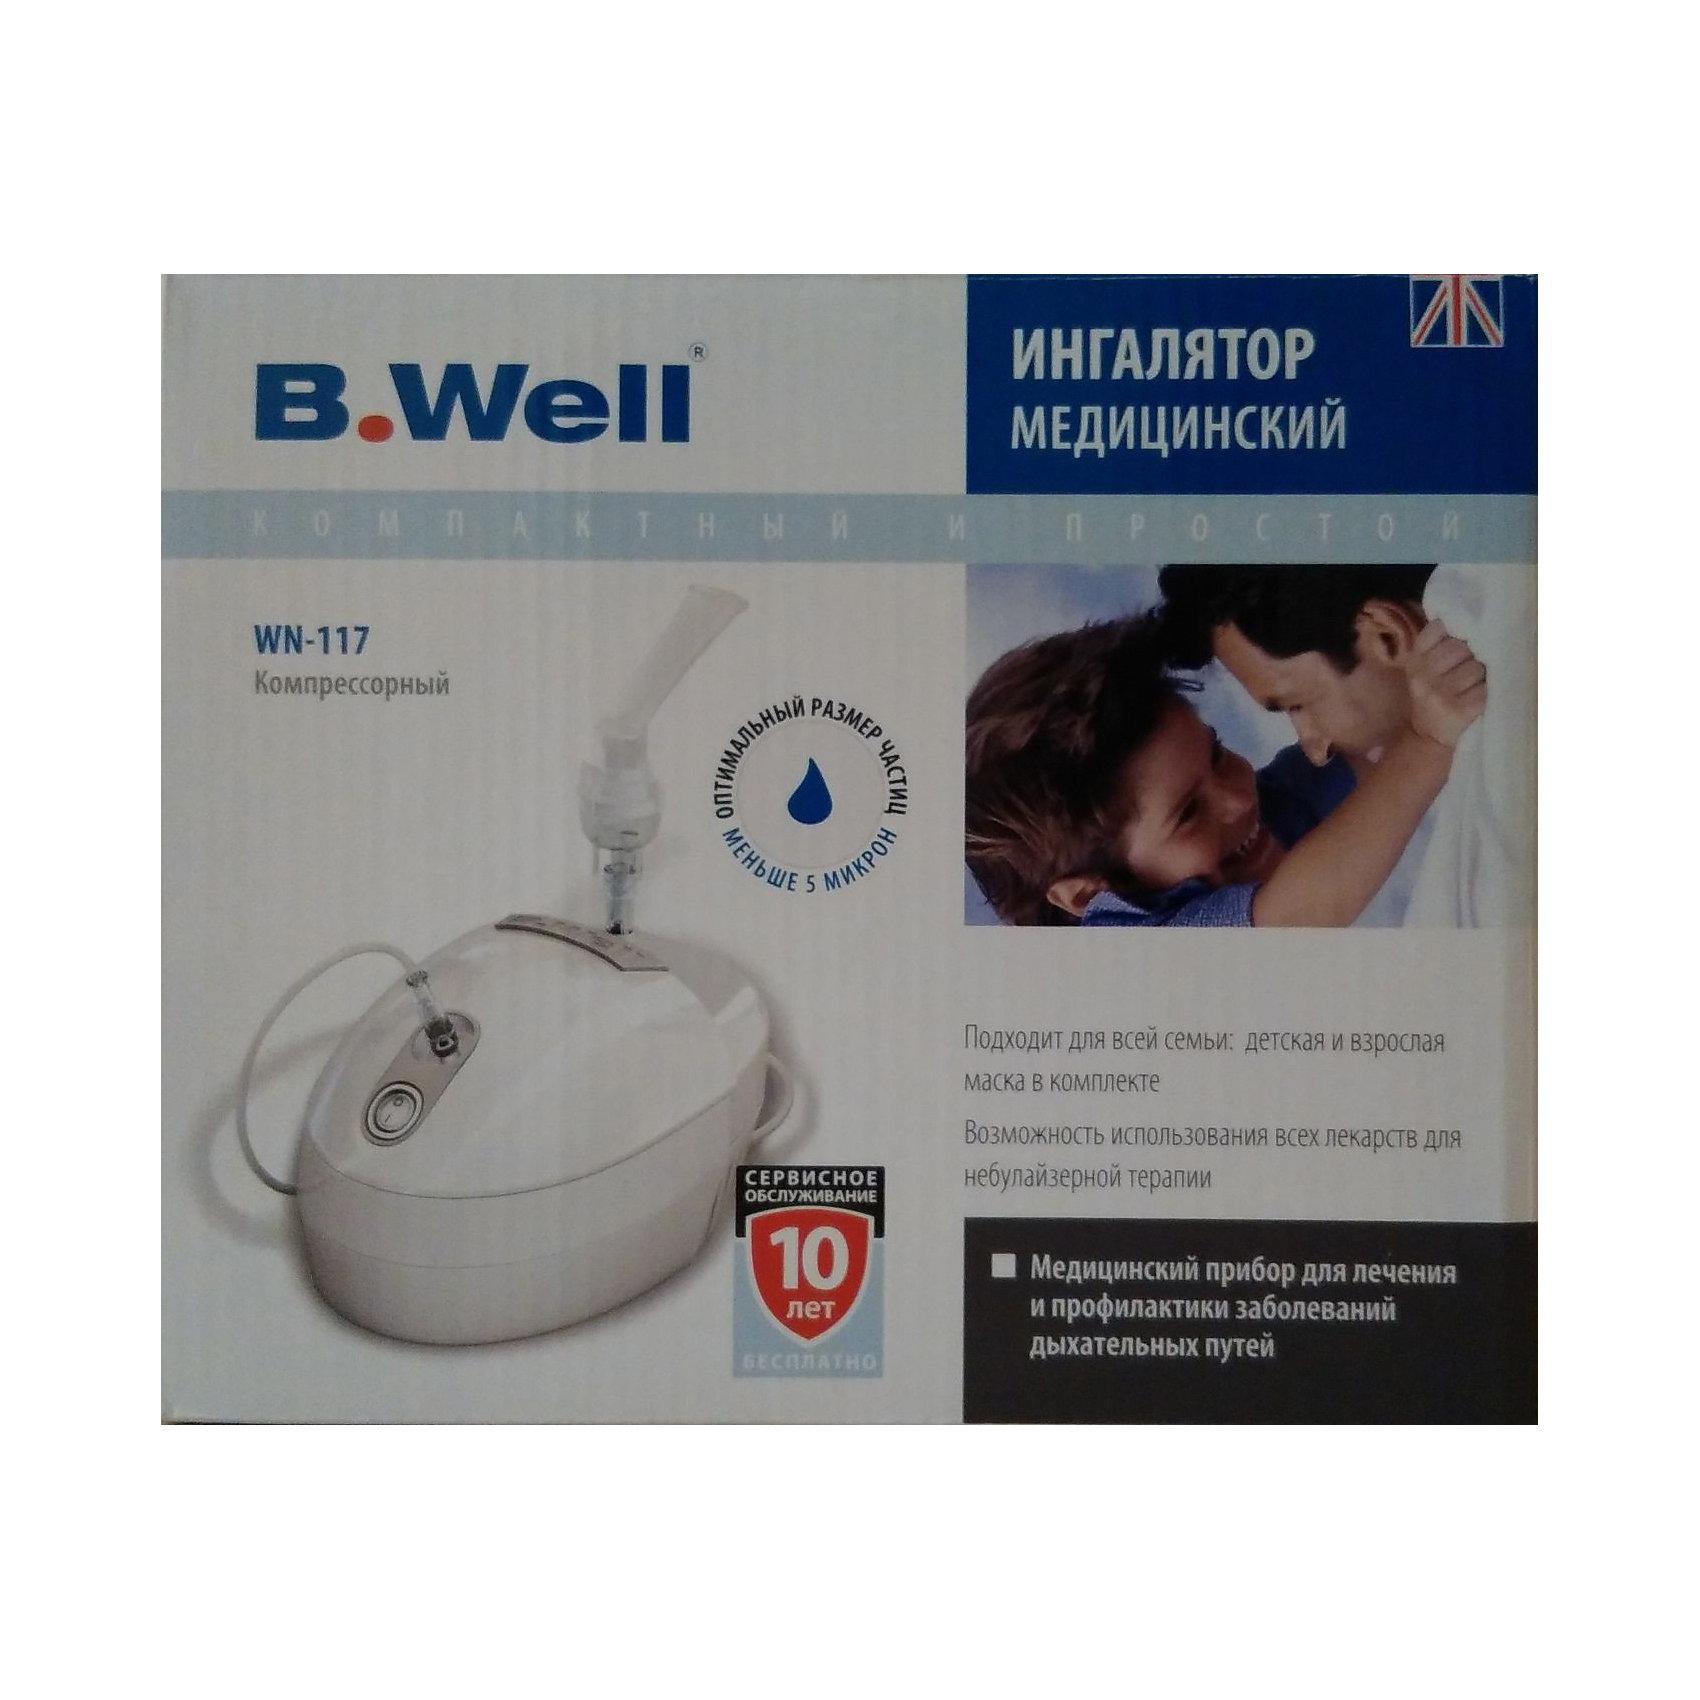 Ингалятор компрессорный B.Well WN-117